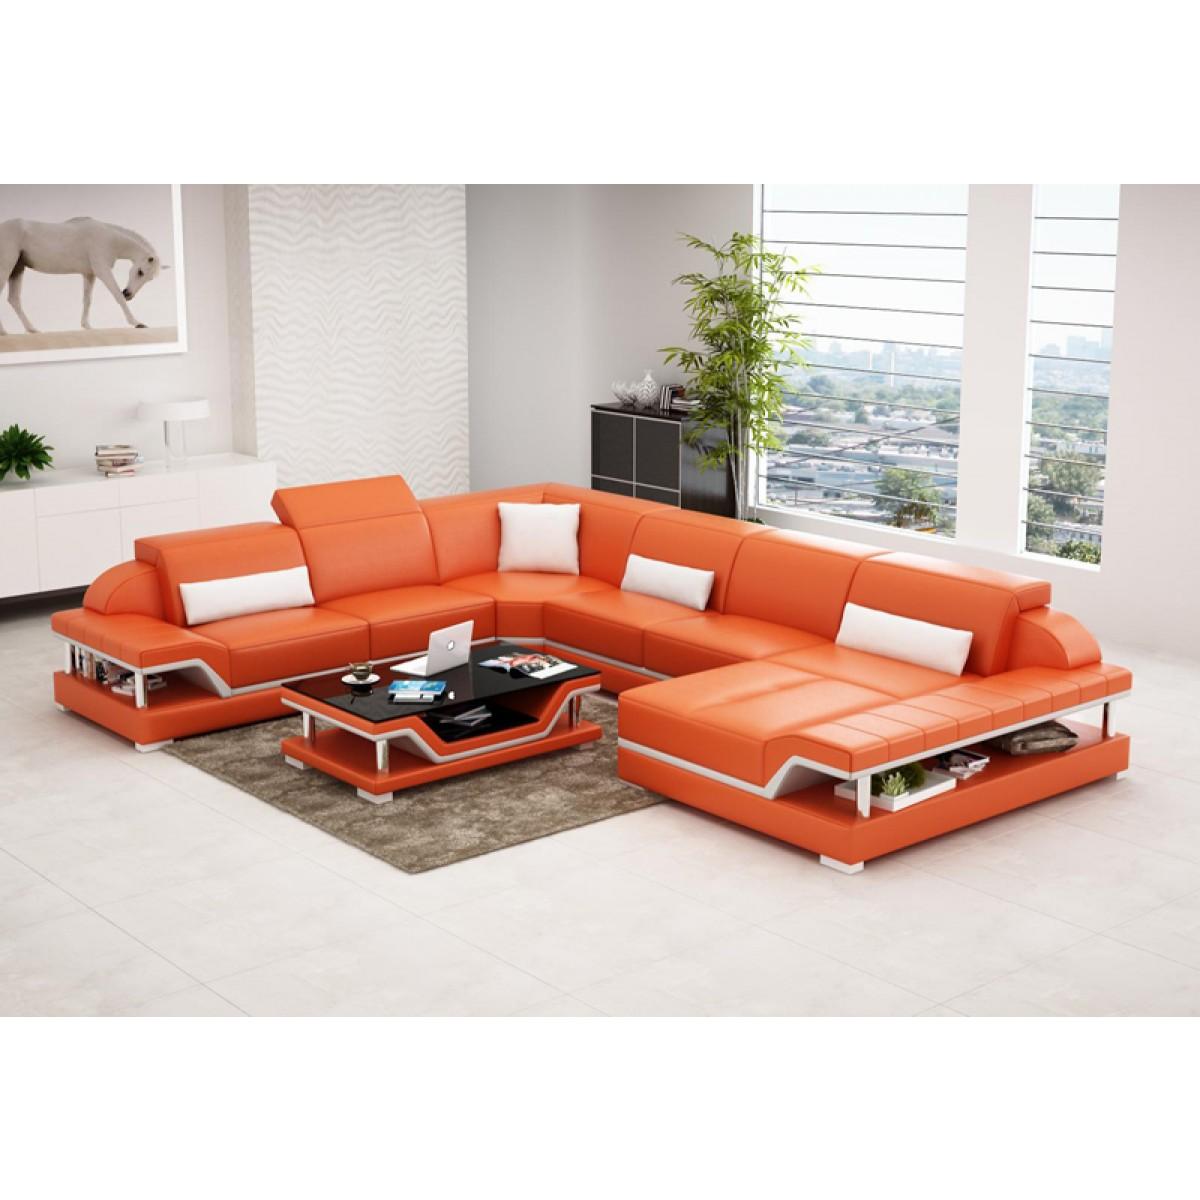 Canap d 39 angle panoramique en cuir milano xl pop - Canape panoramique en cuir ...